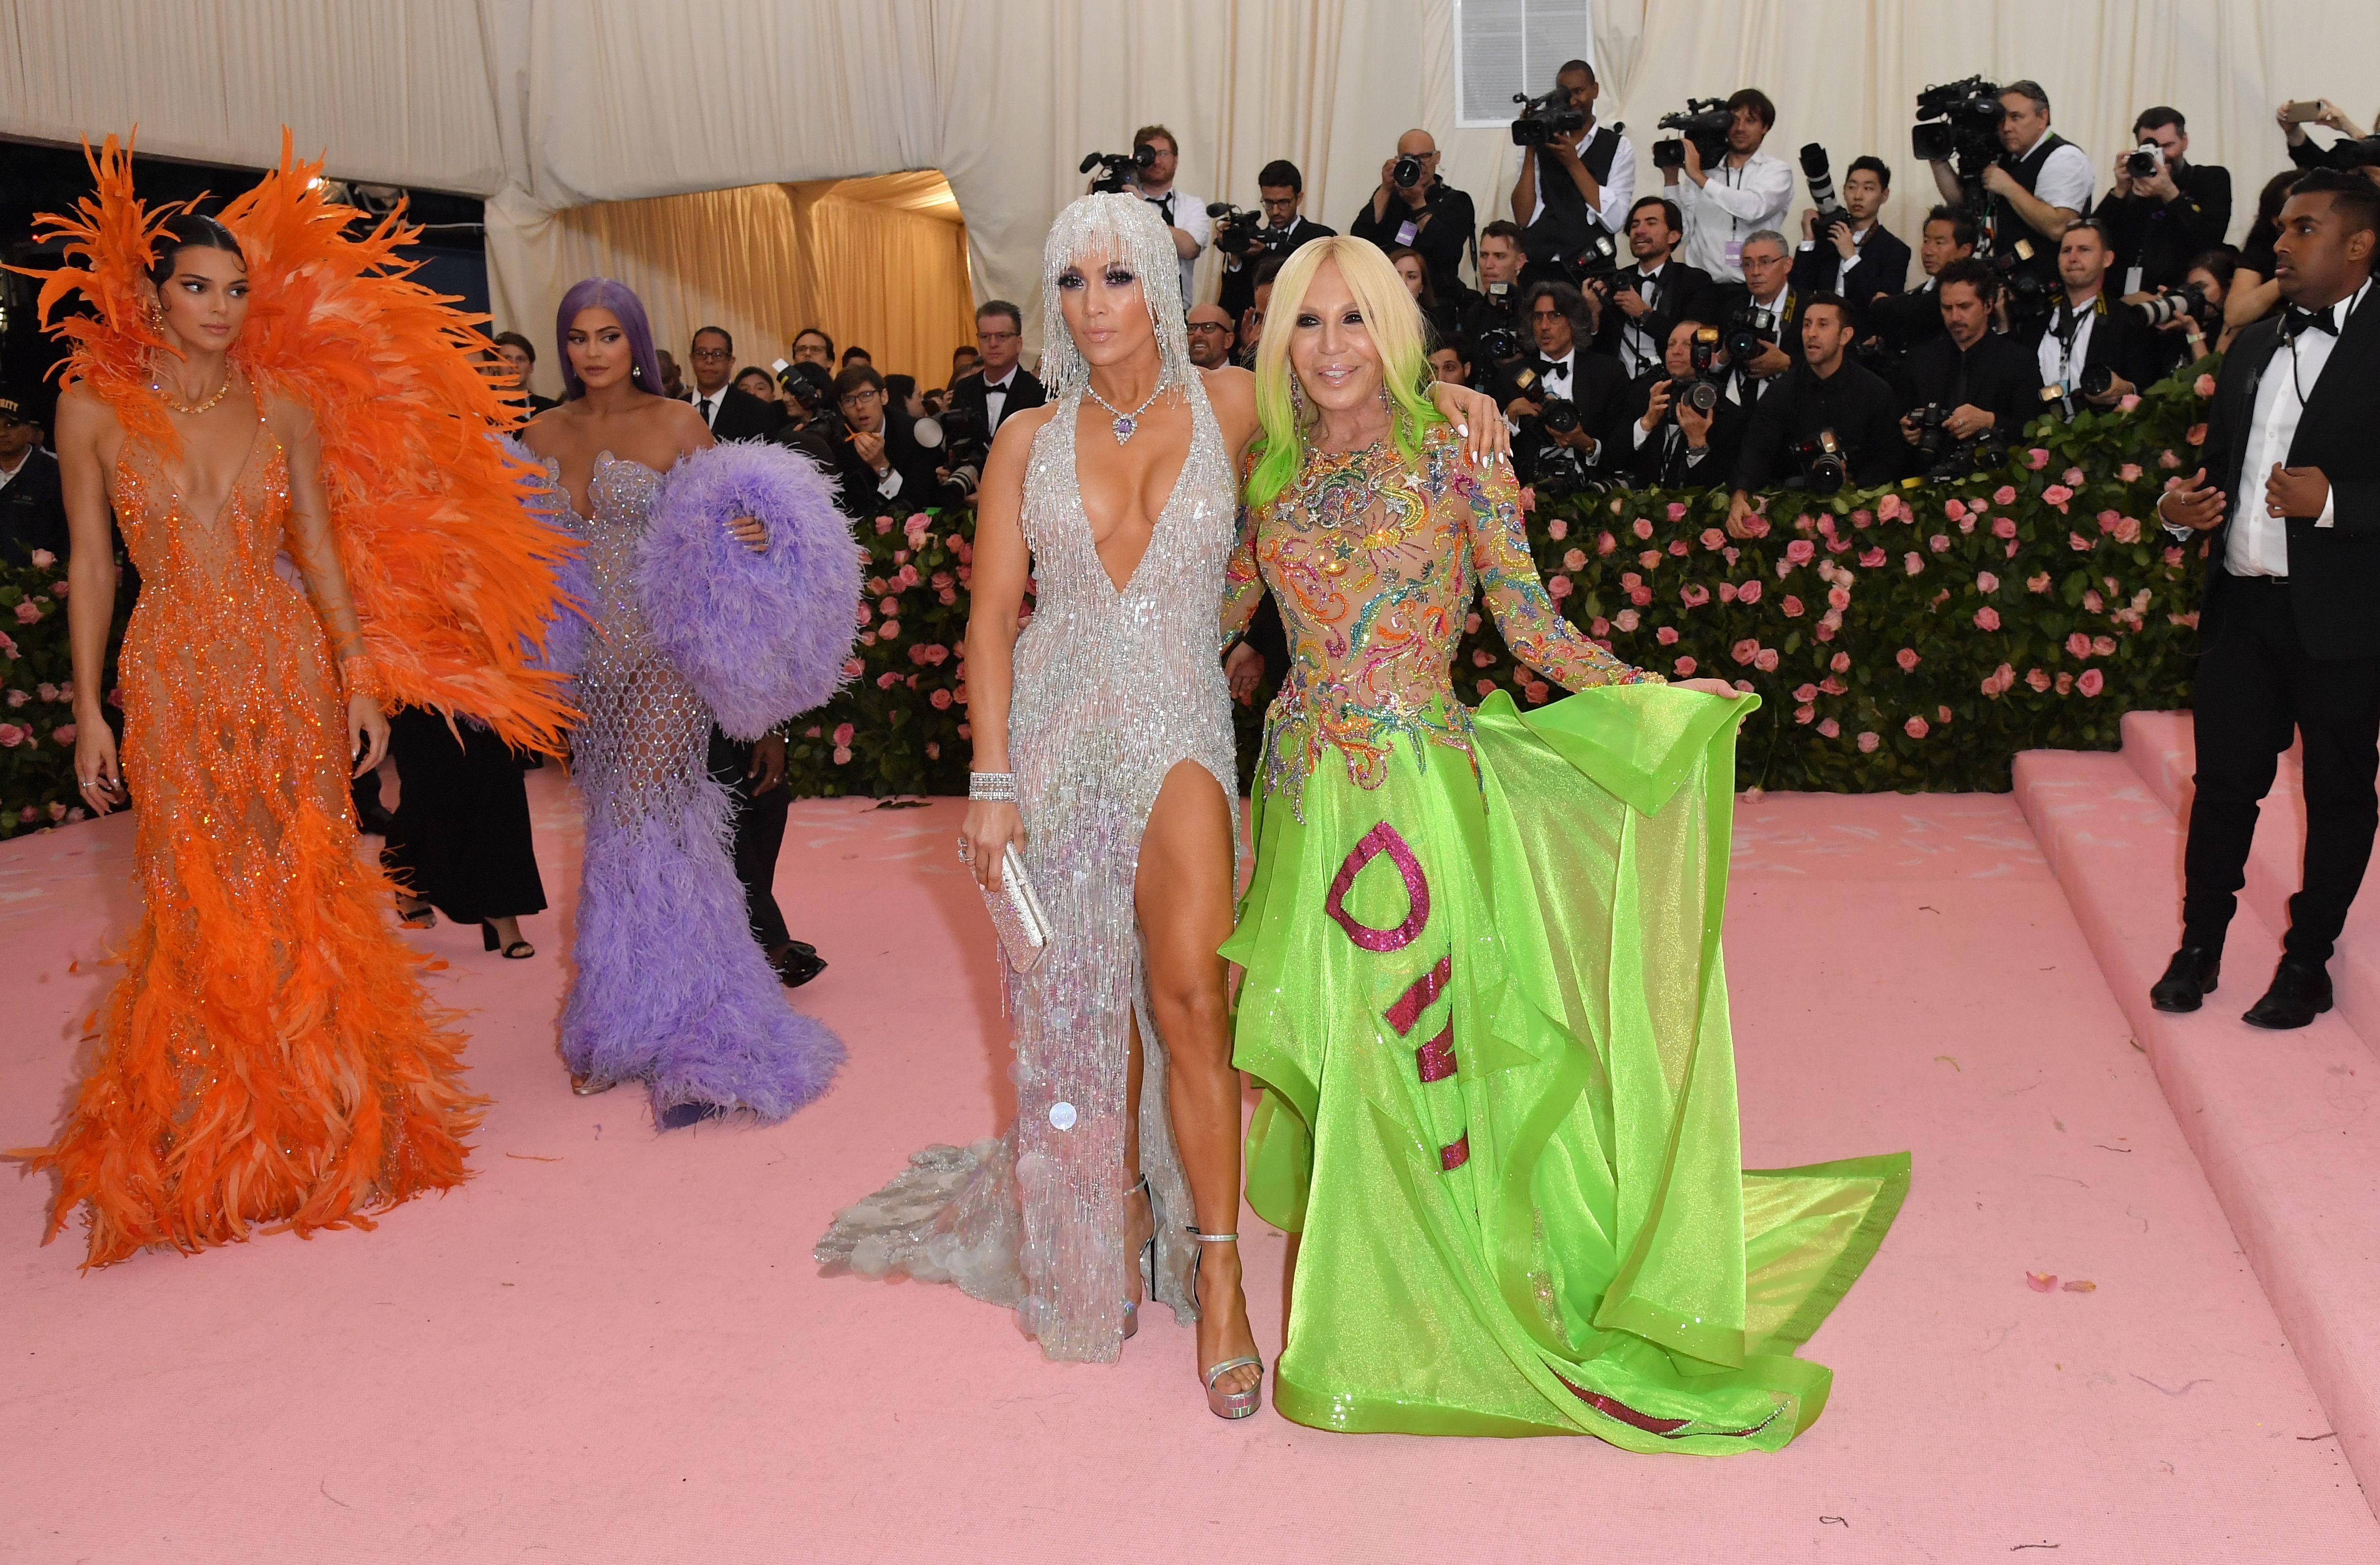 Kylie Jenner gives Jennifer Lopez some hilarious Met Gala side-eye, plus more news